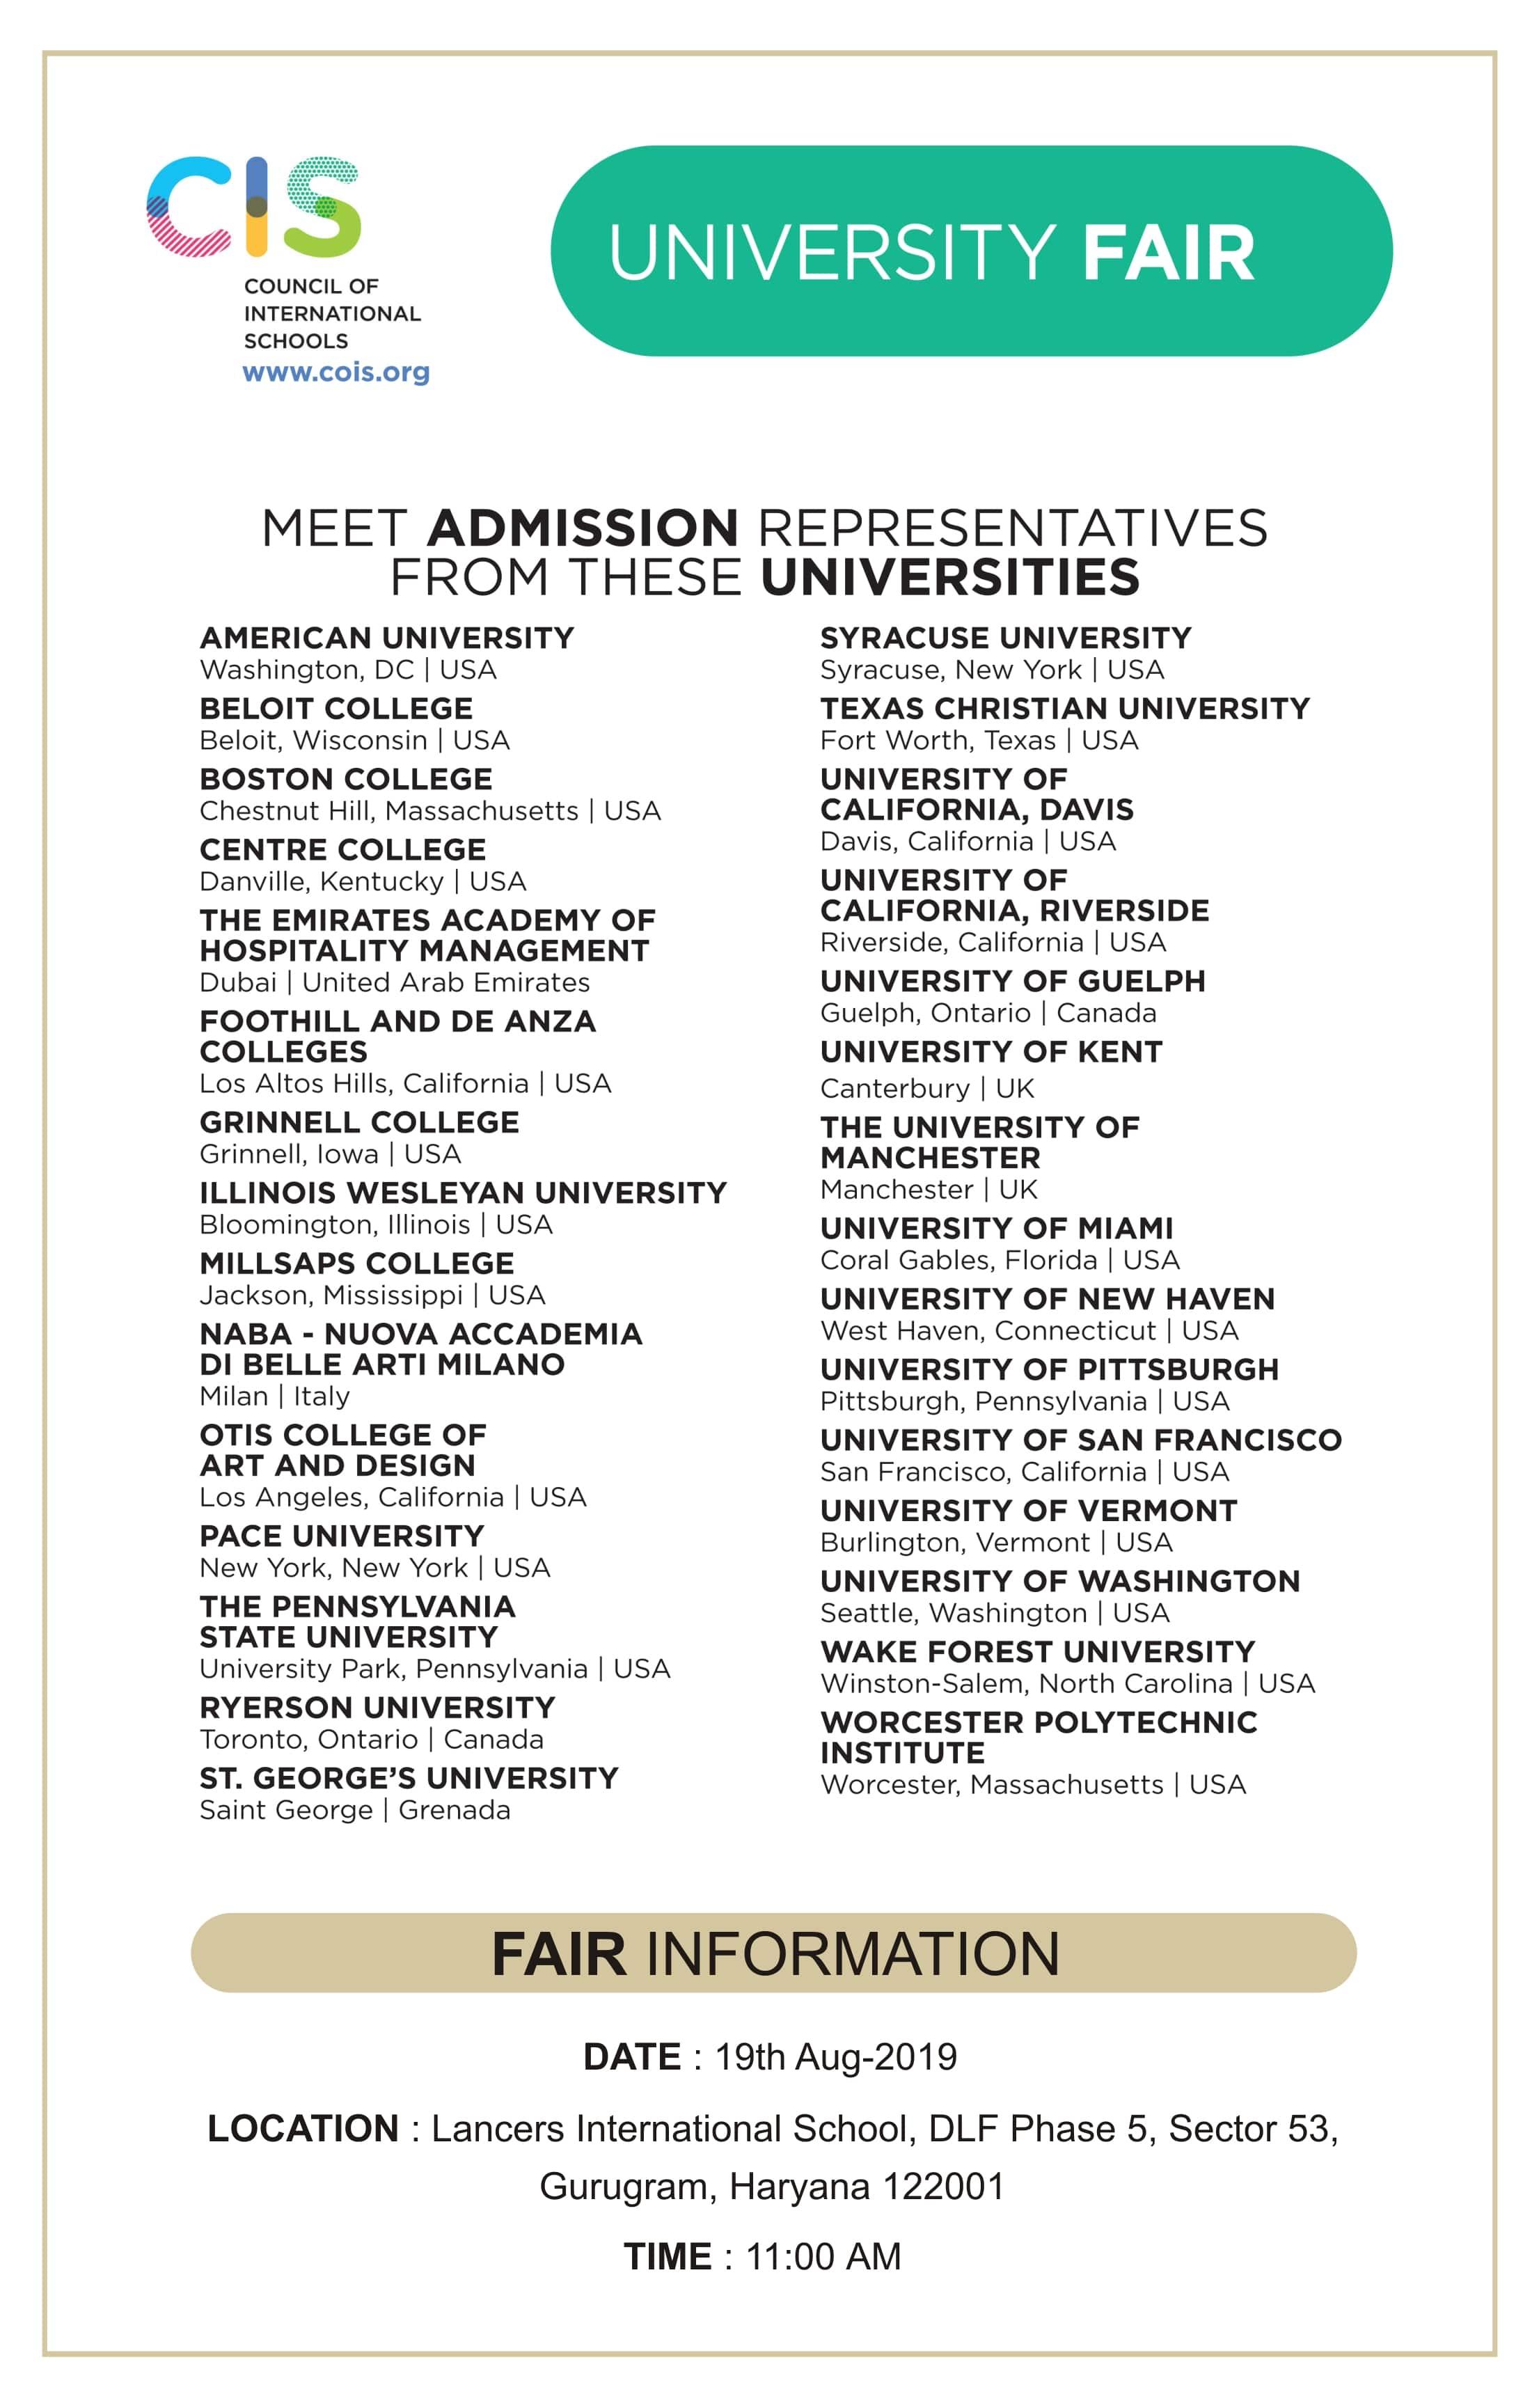 CIS University Fair